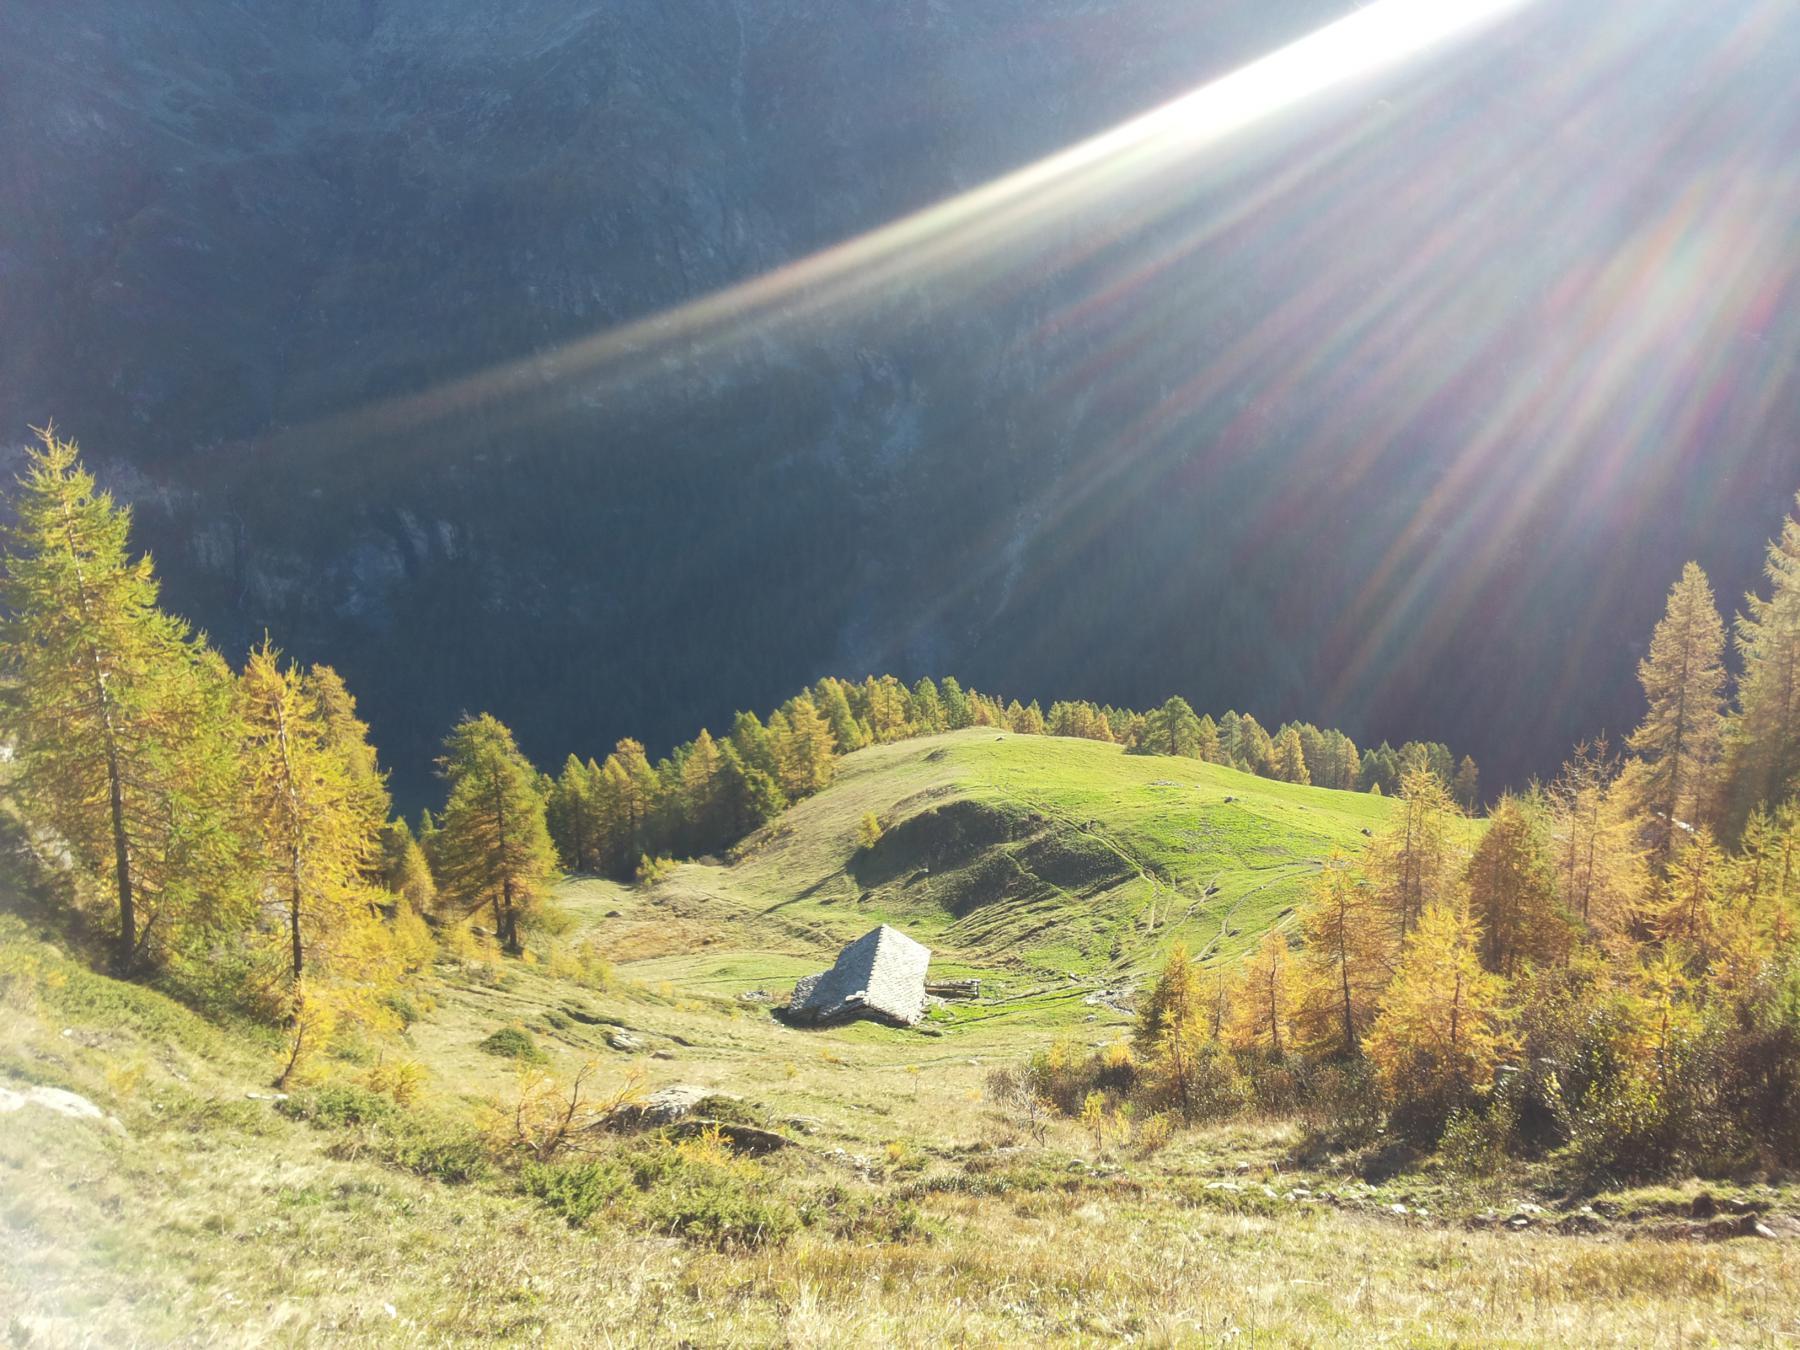 Casolari sopra Alpenzu